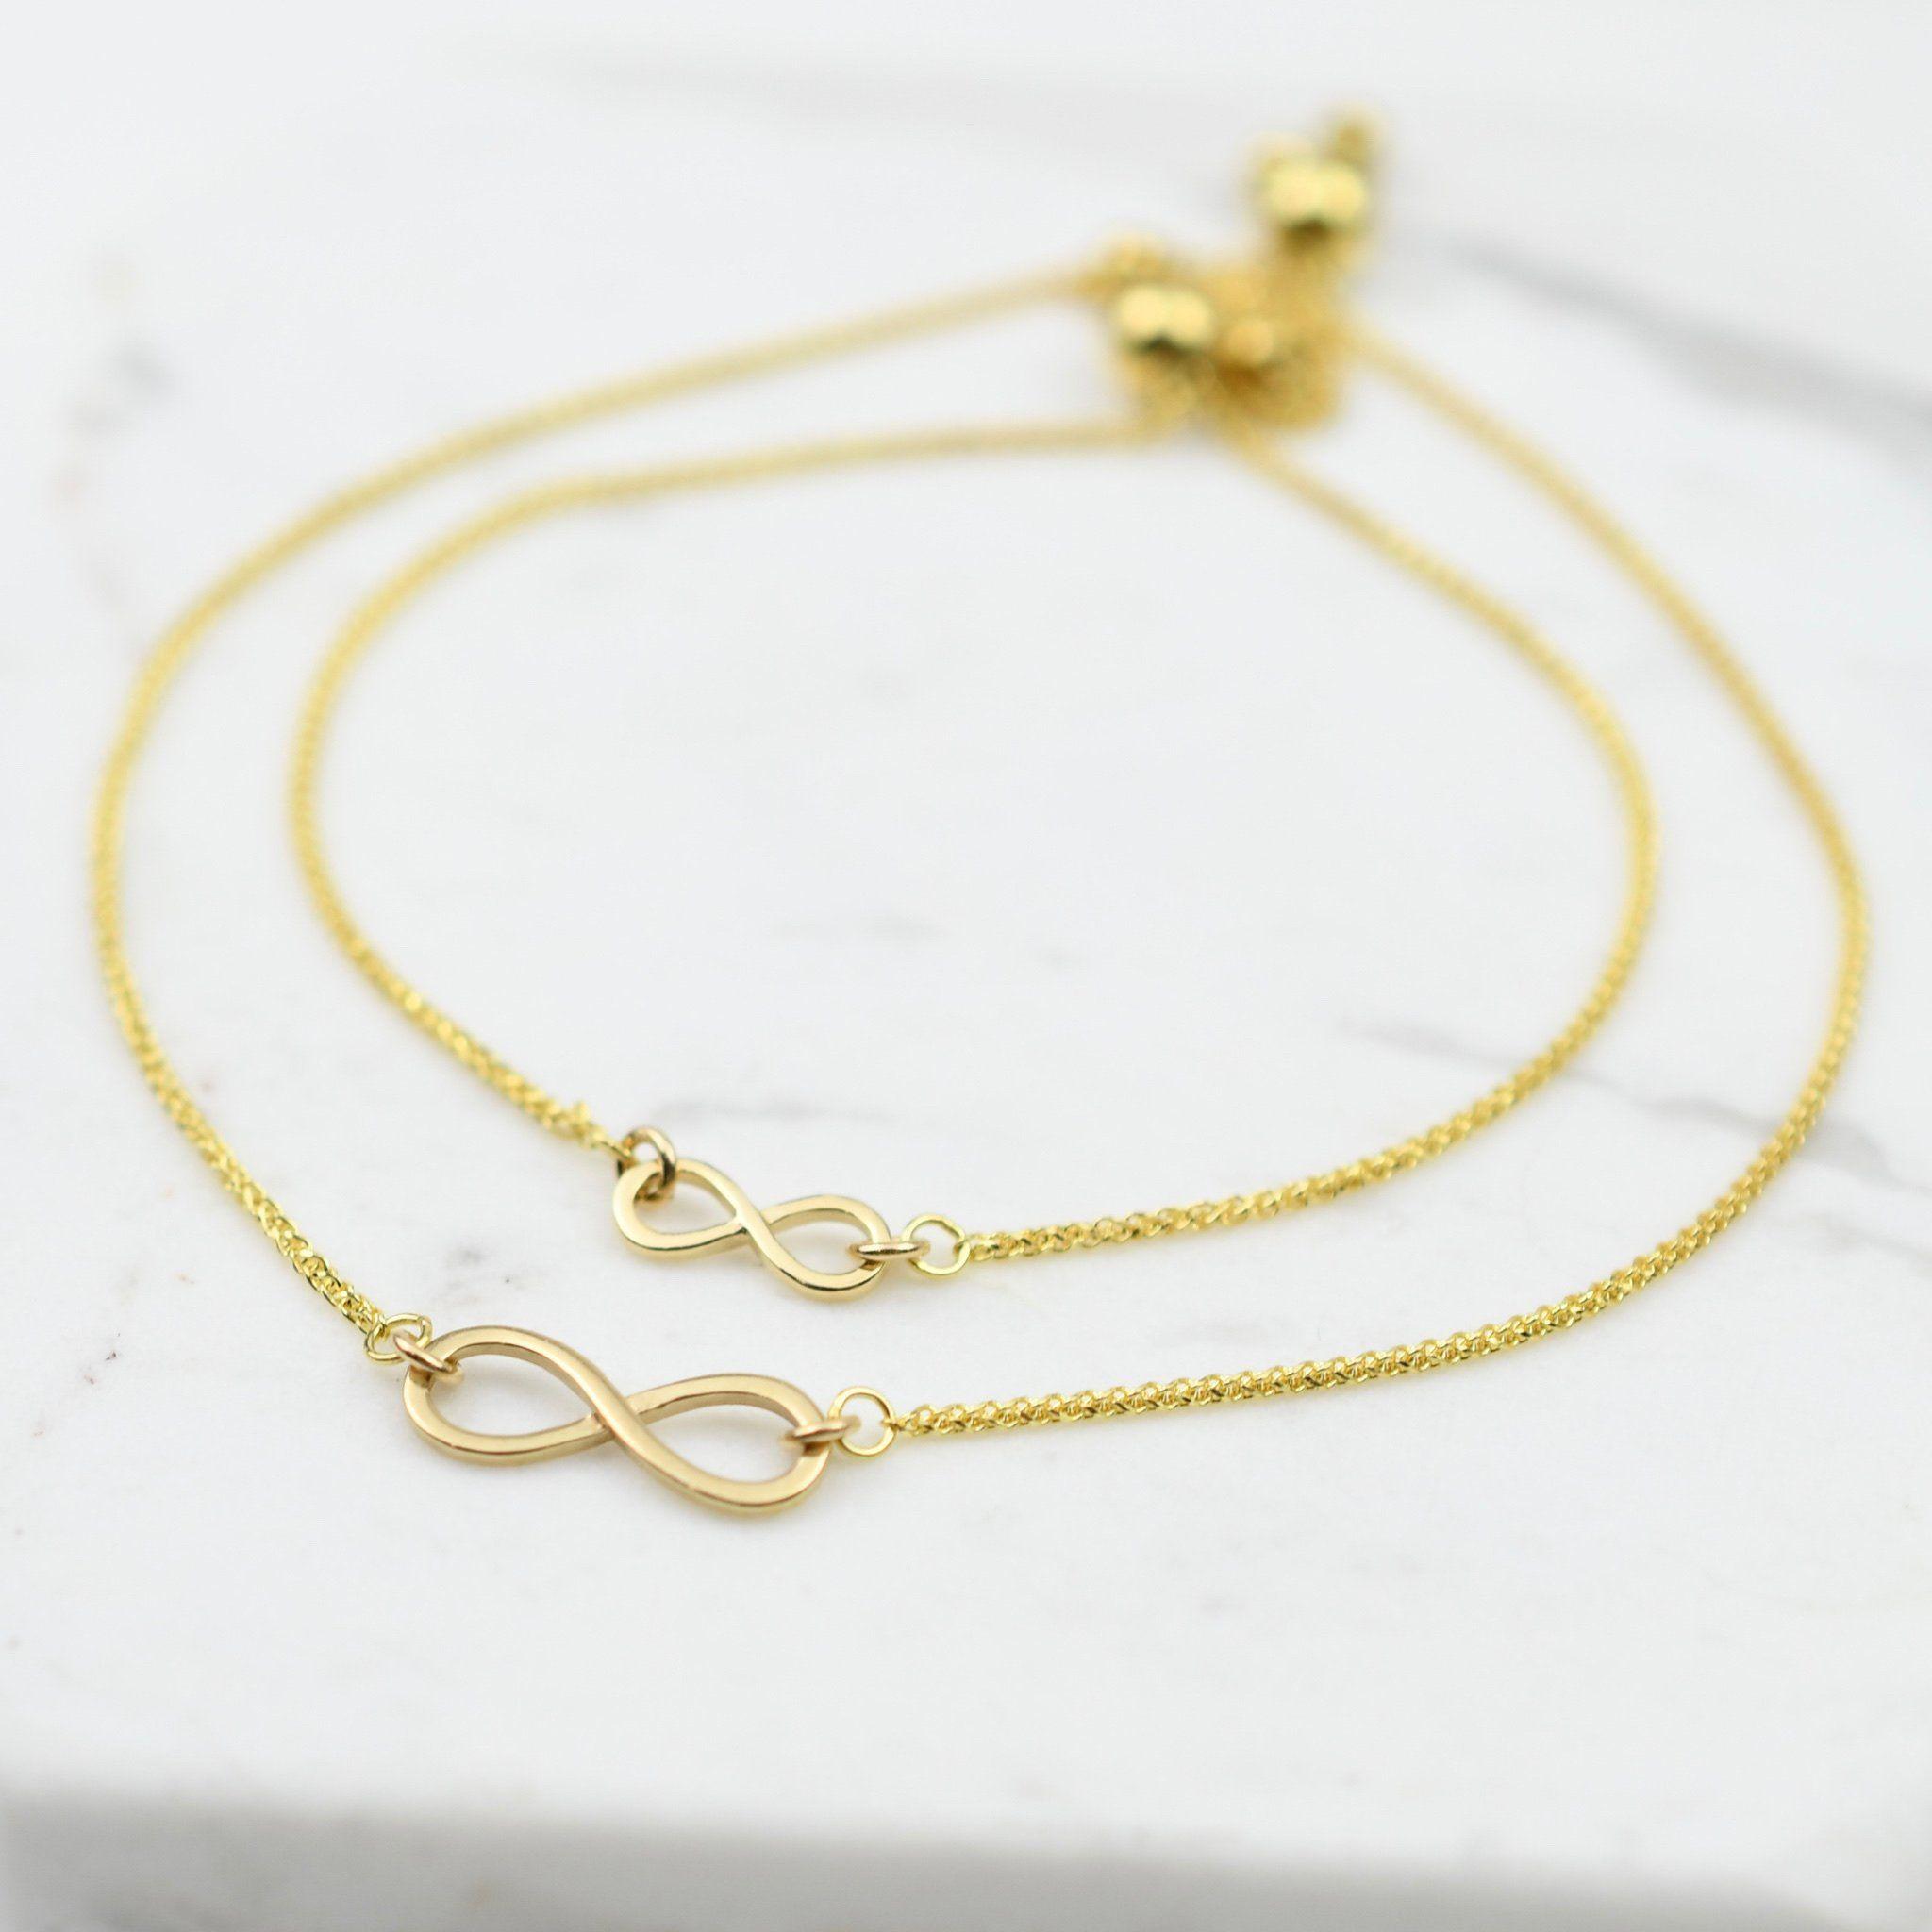 14k yellow gold infinity charm bracelet